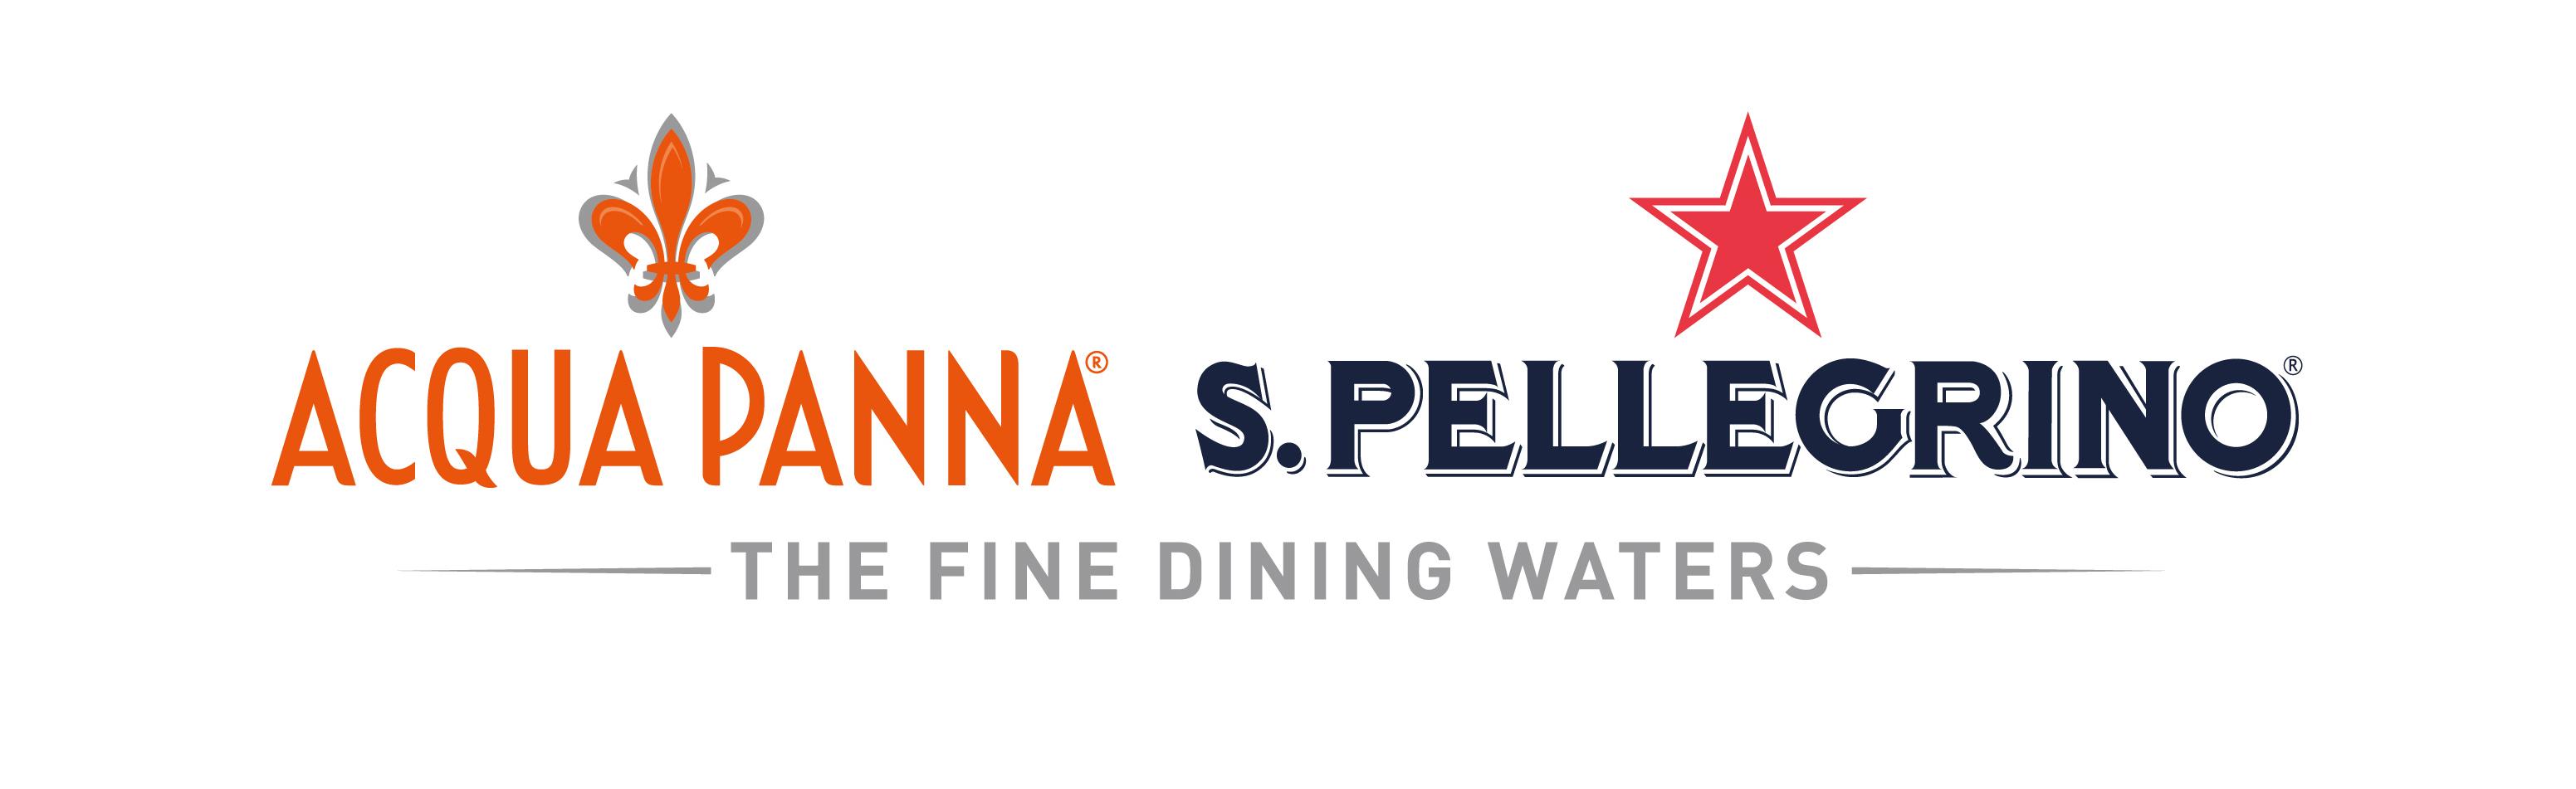 Acqua Panna/S.Pellegrino